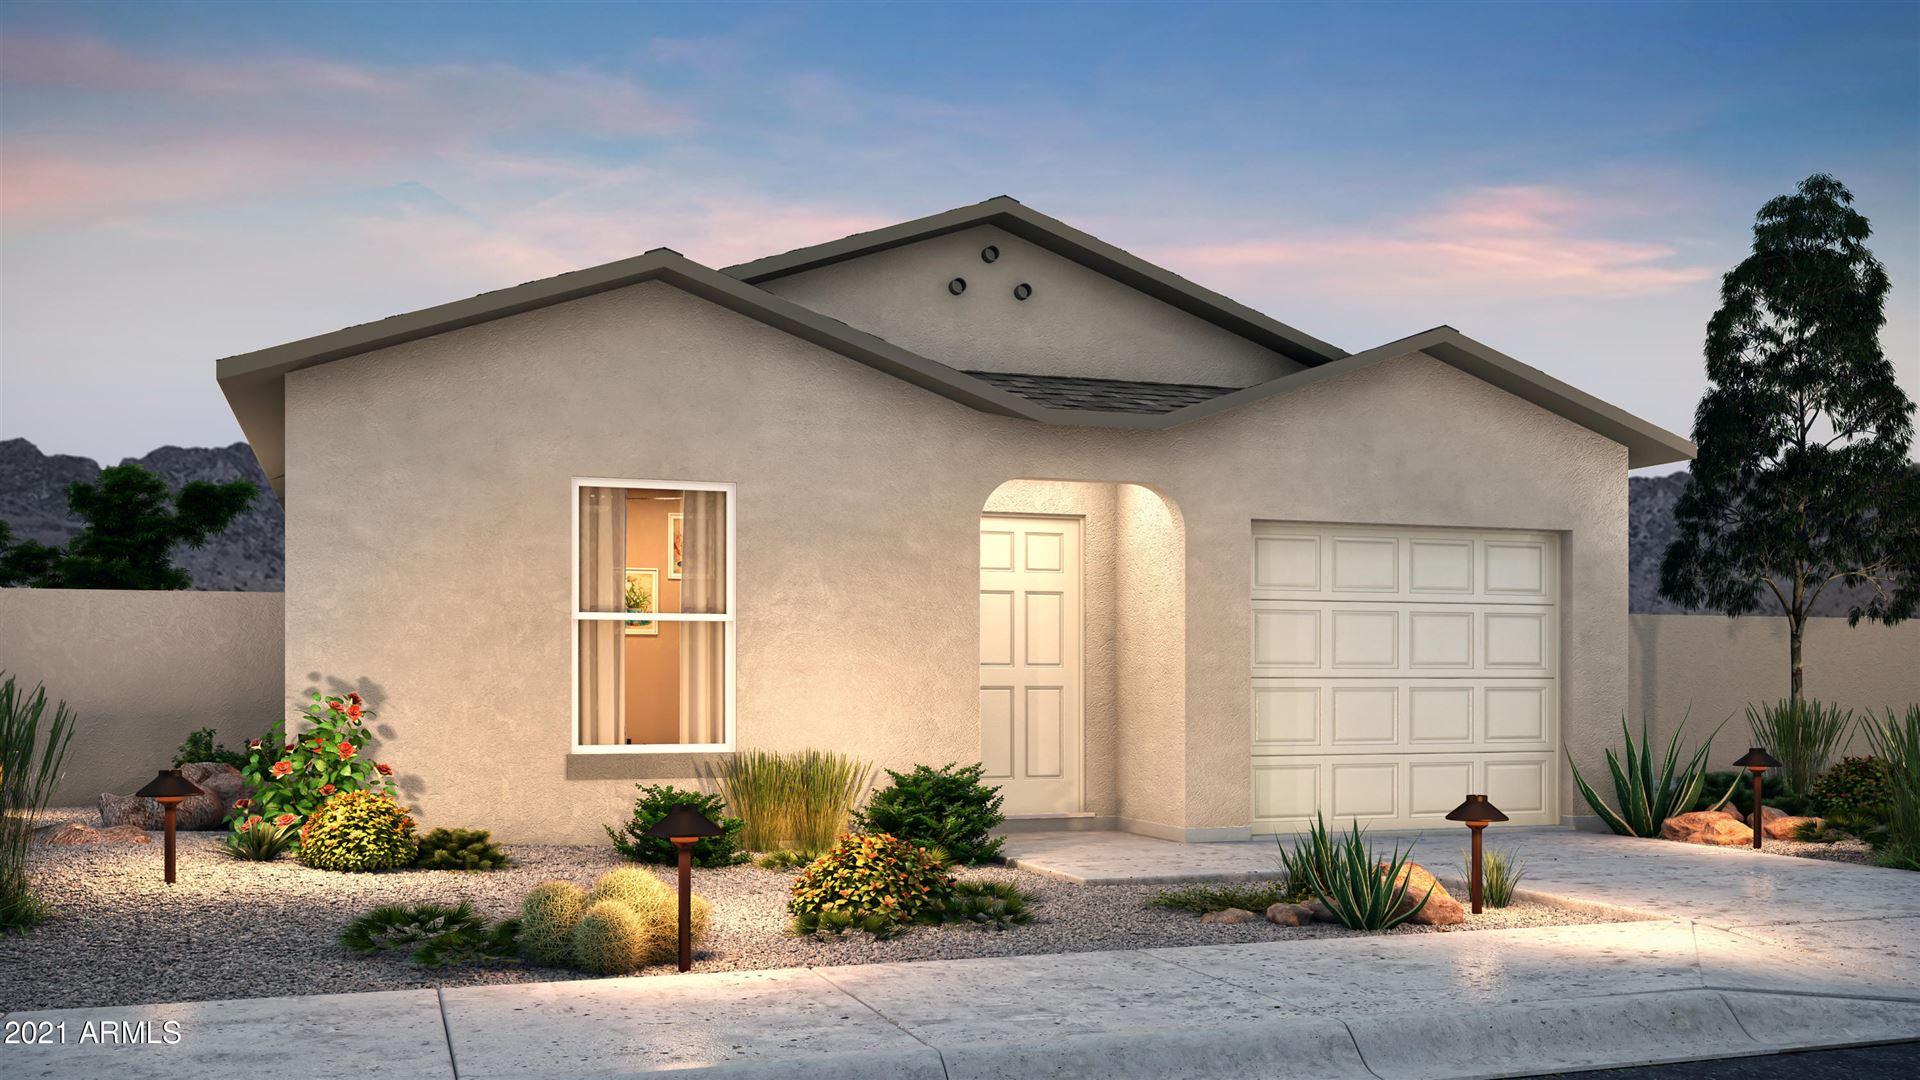 Photo of 457 W Hilquit Drive, Morristown, AZ 85342 (MLS # 6190323)